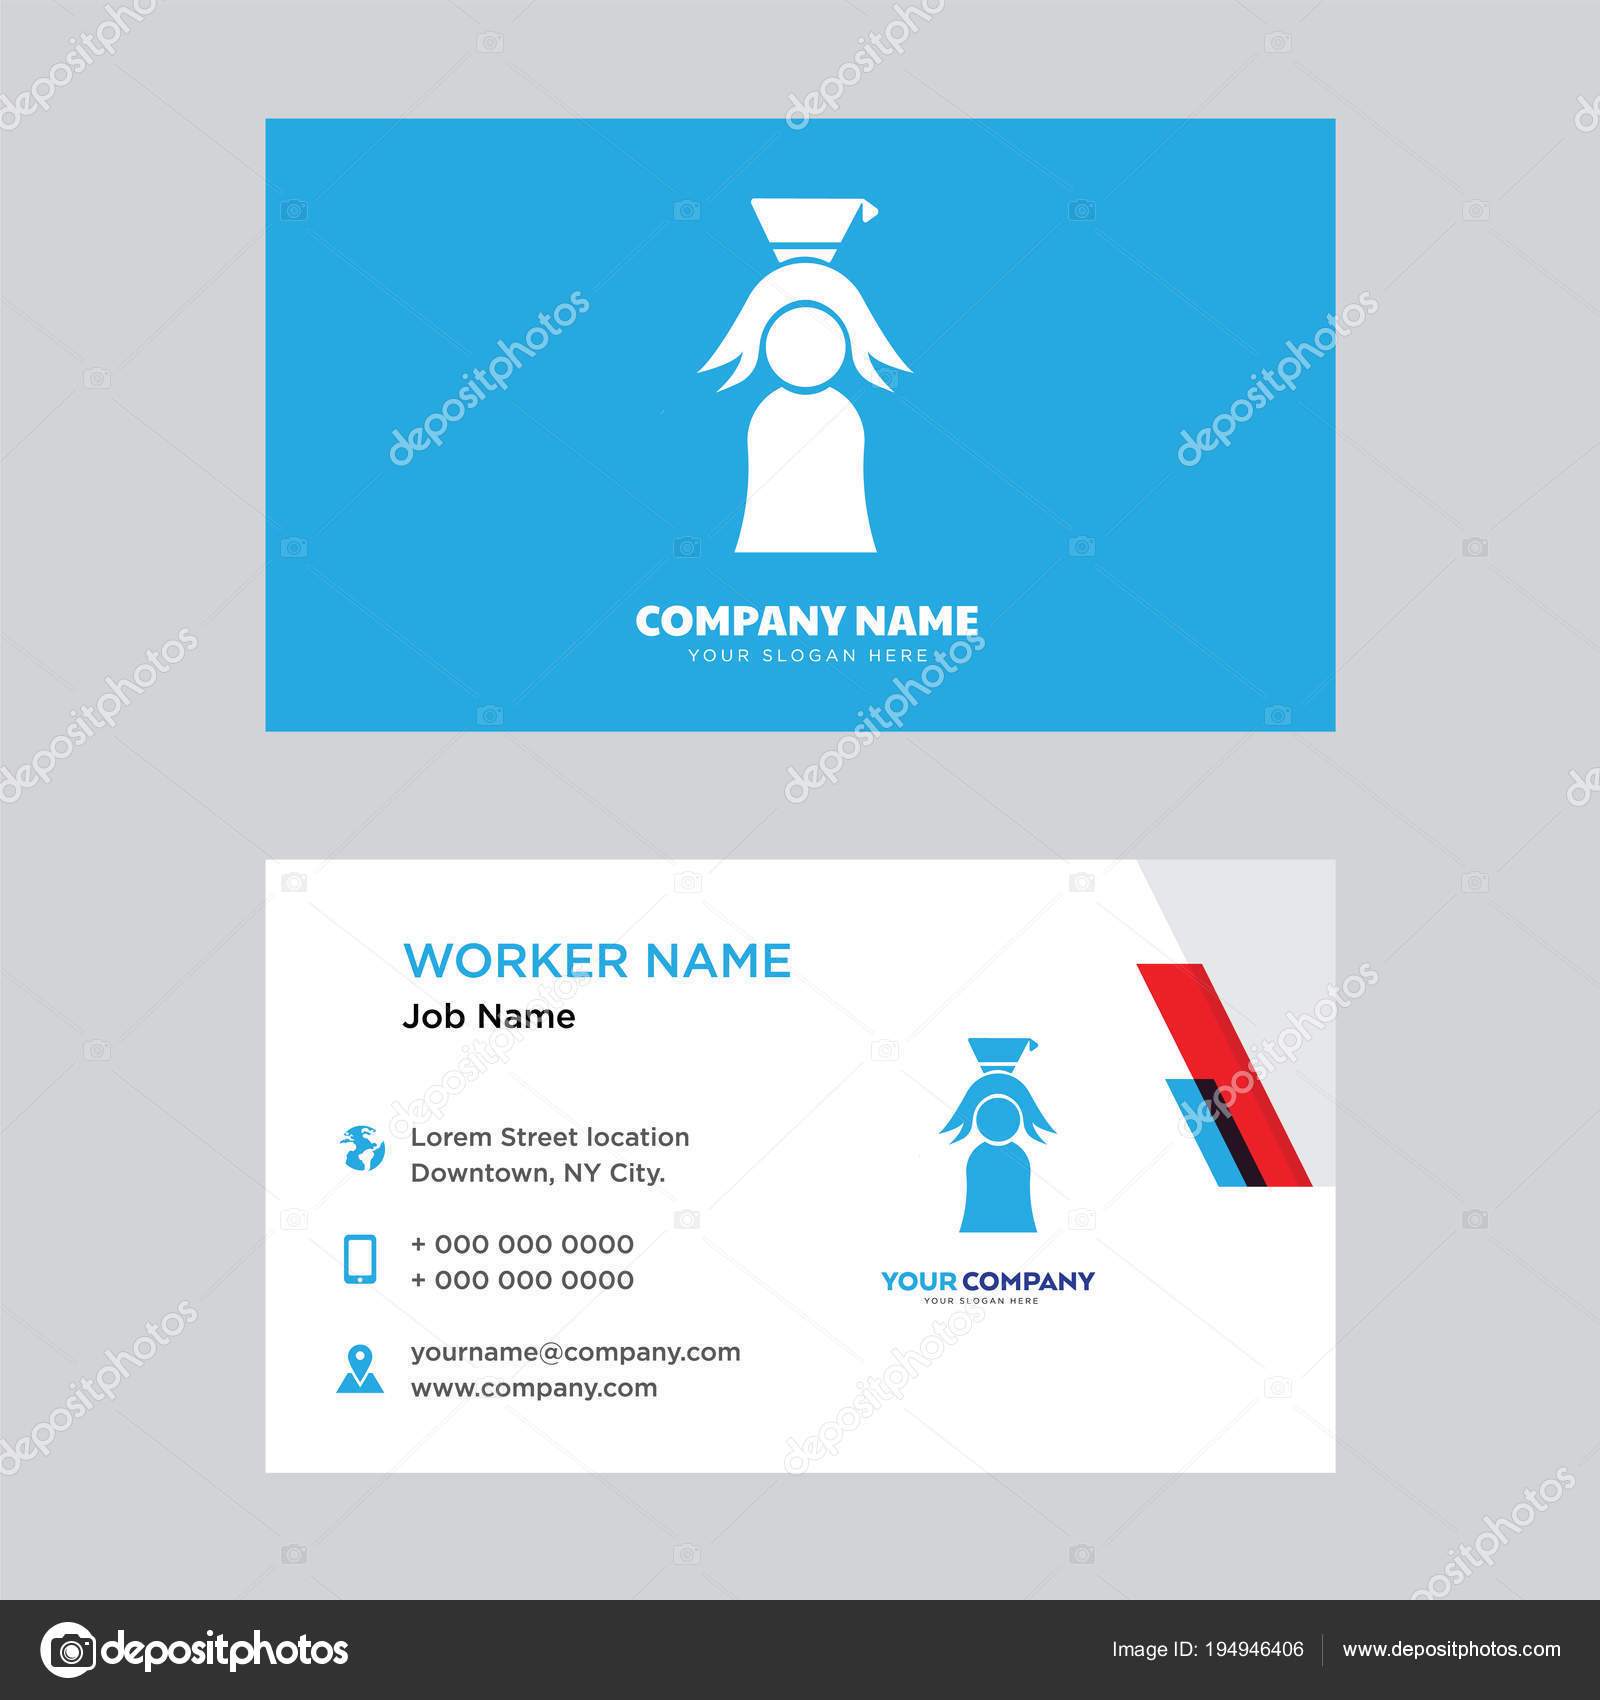 Graduate business card design stock vector vectorbest 194946406 graduate business card design stock vector colourmoves